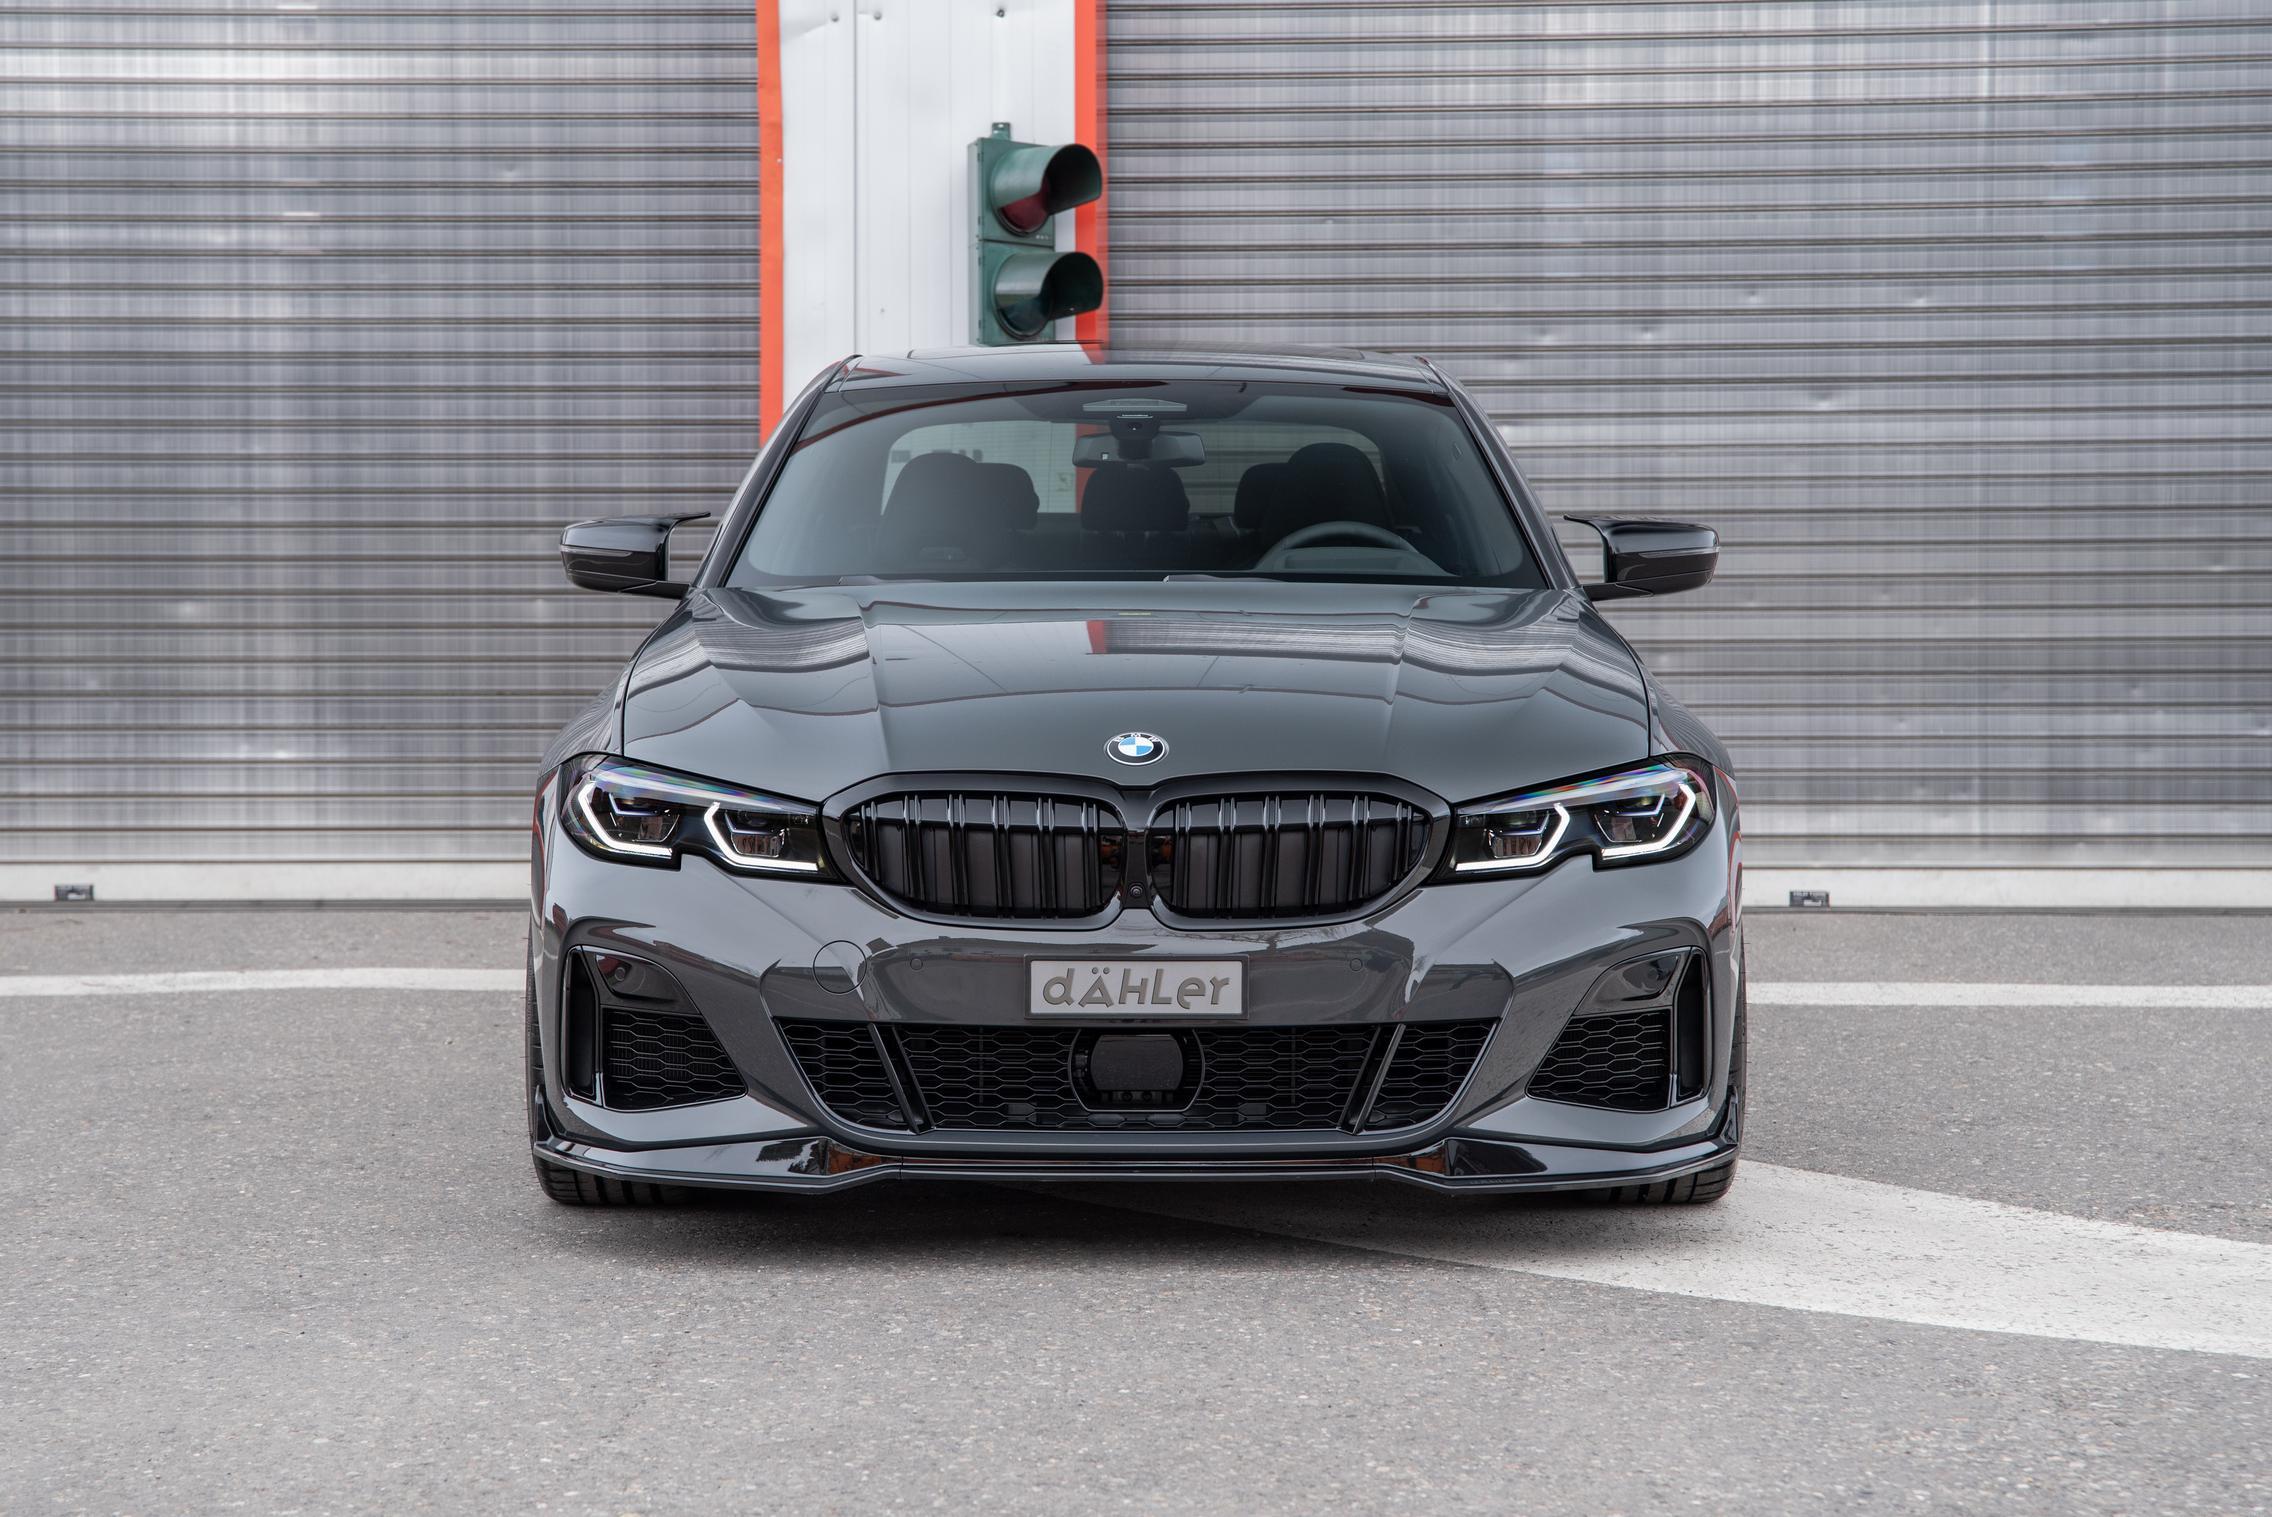 Dahler BMW M340i xDrive front